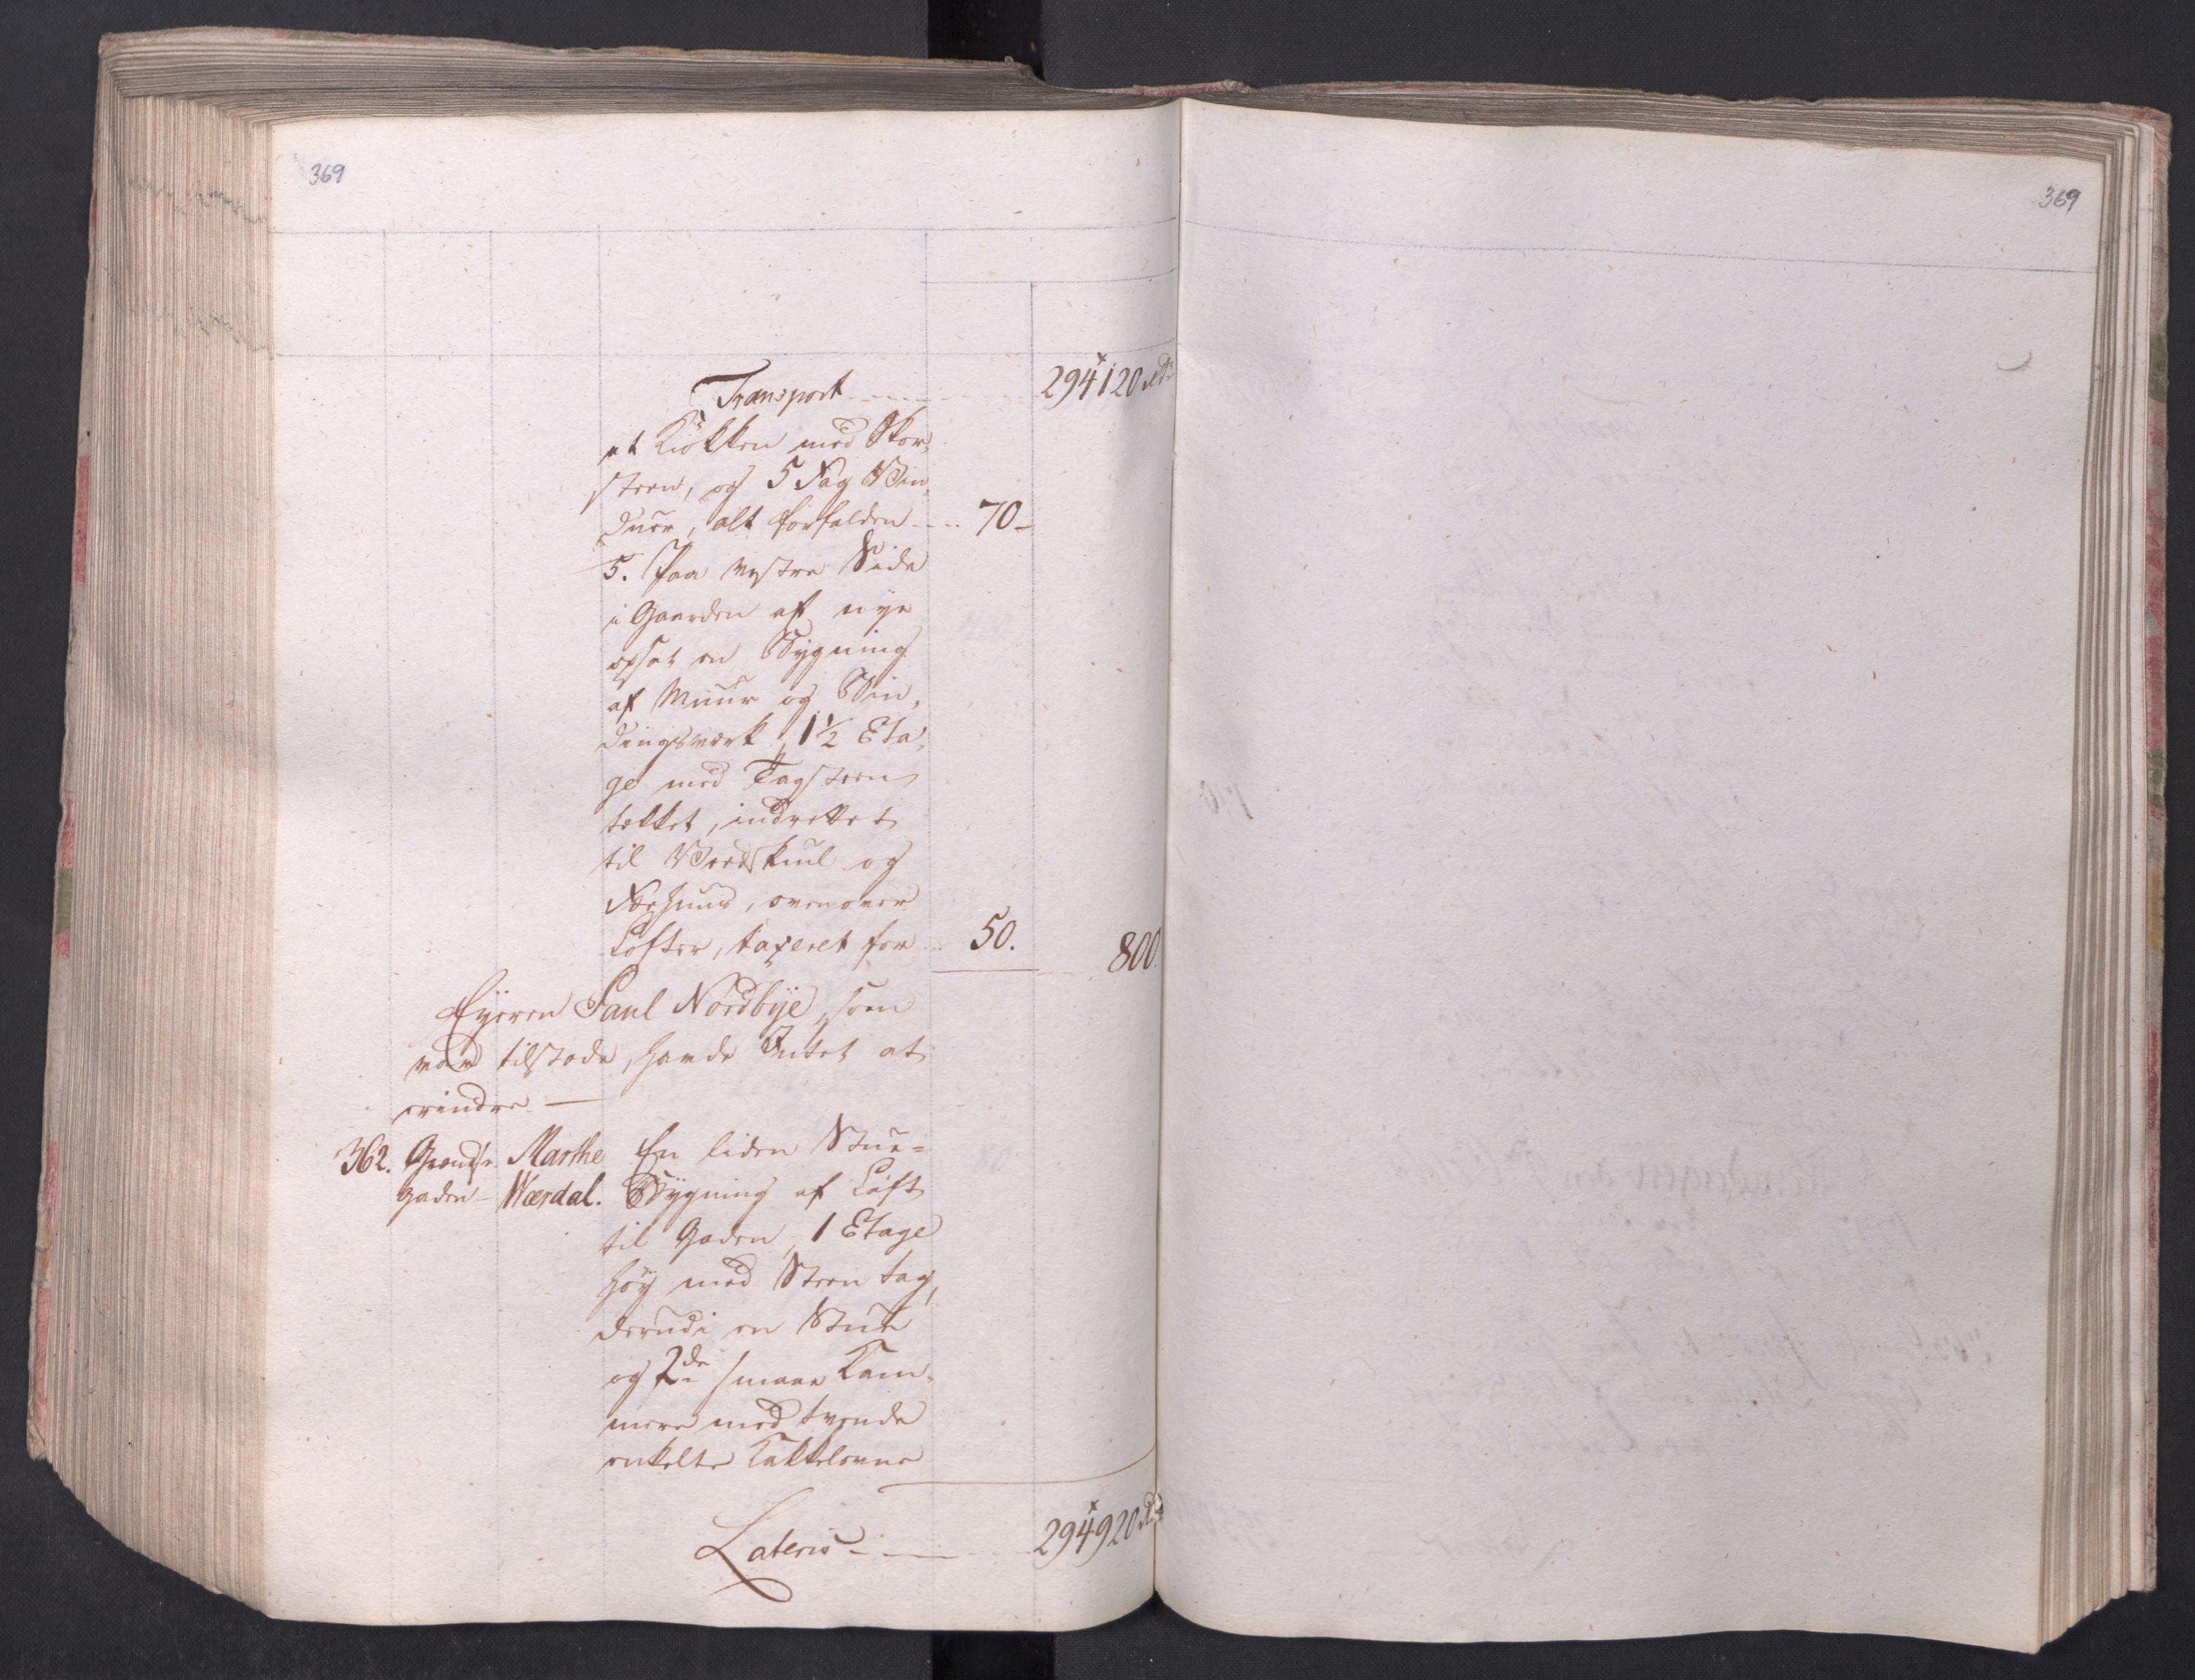 SAO, Kristiania stiftamt, I/Ia/L0015: Branntakster, 1797, s. 369